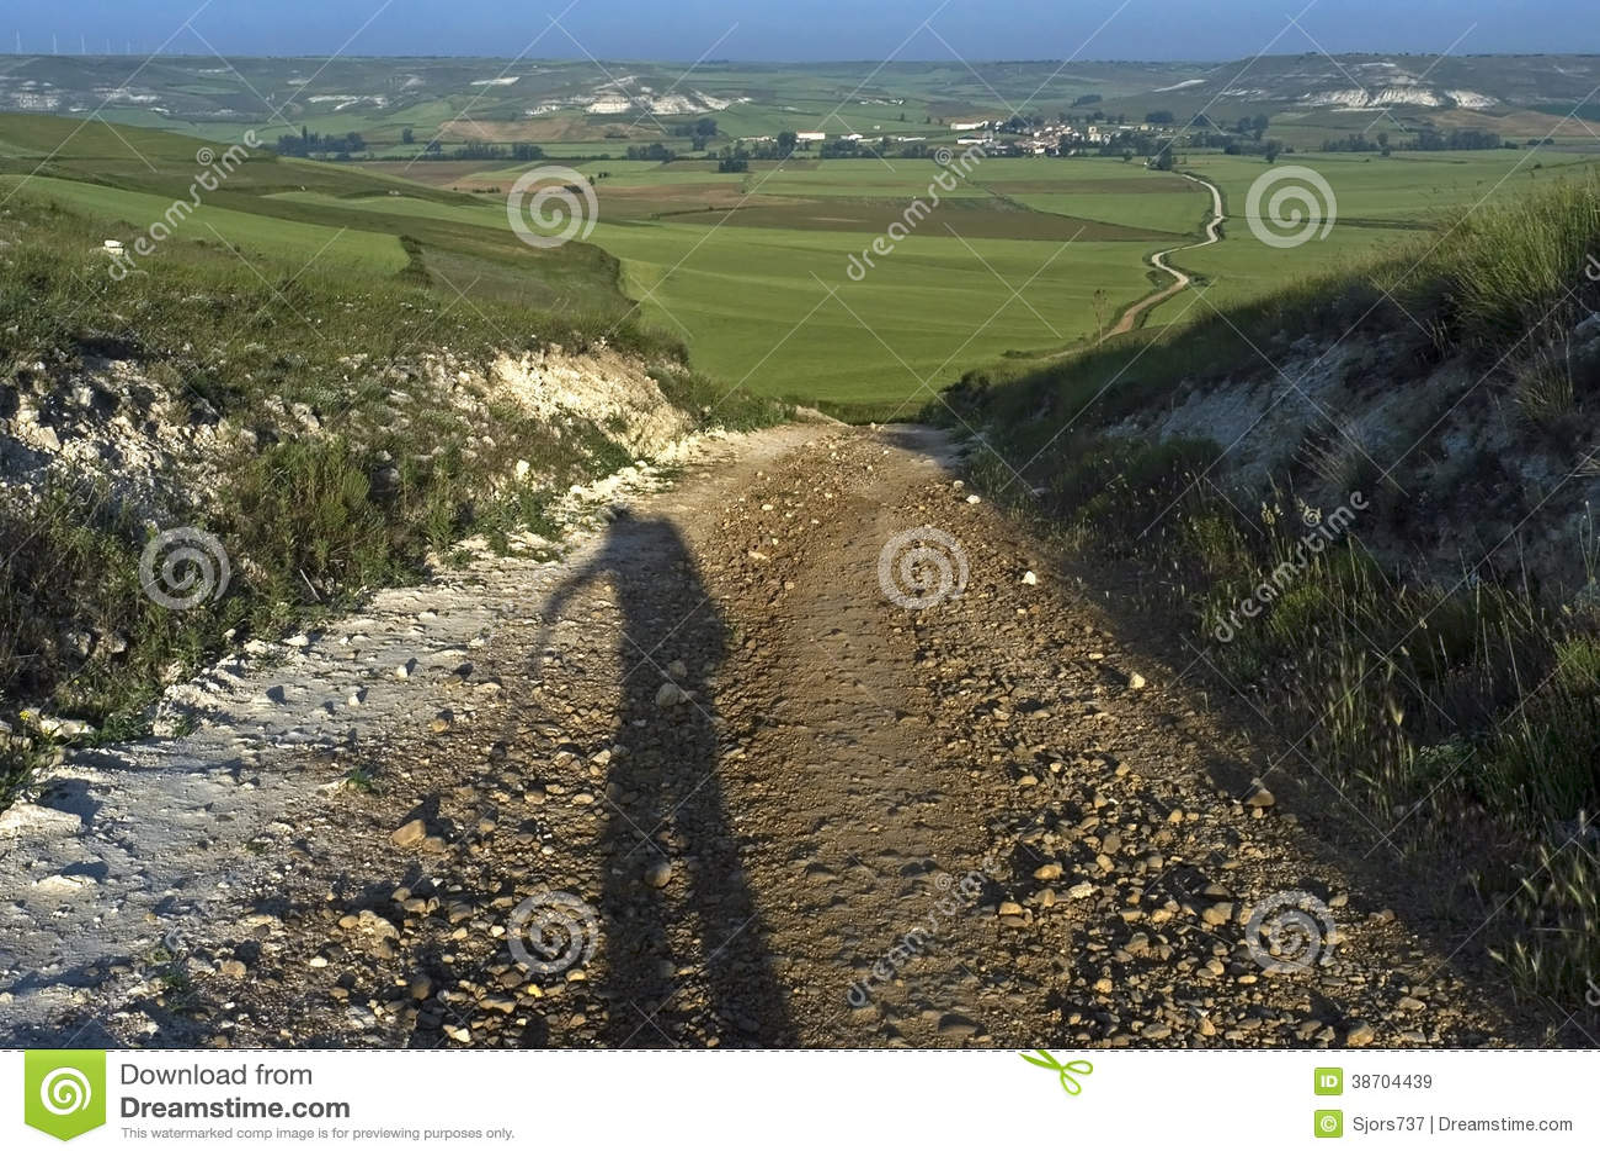 Sombree al peregrino, paisaje rural, Camino Frances